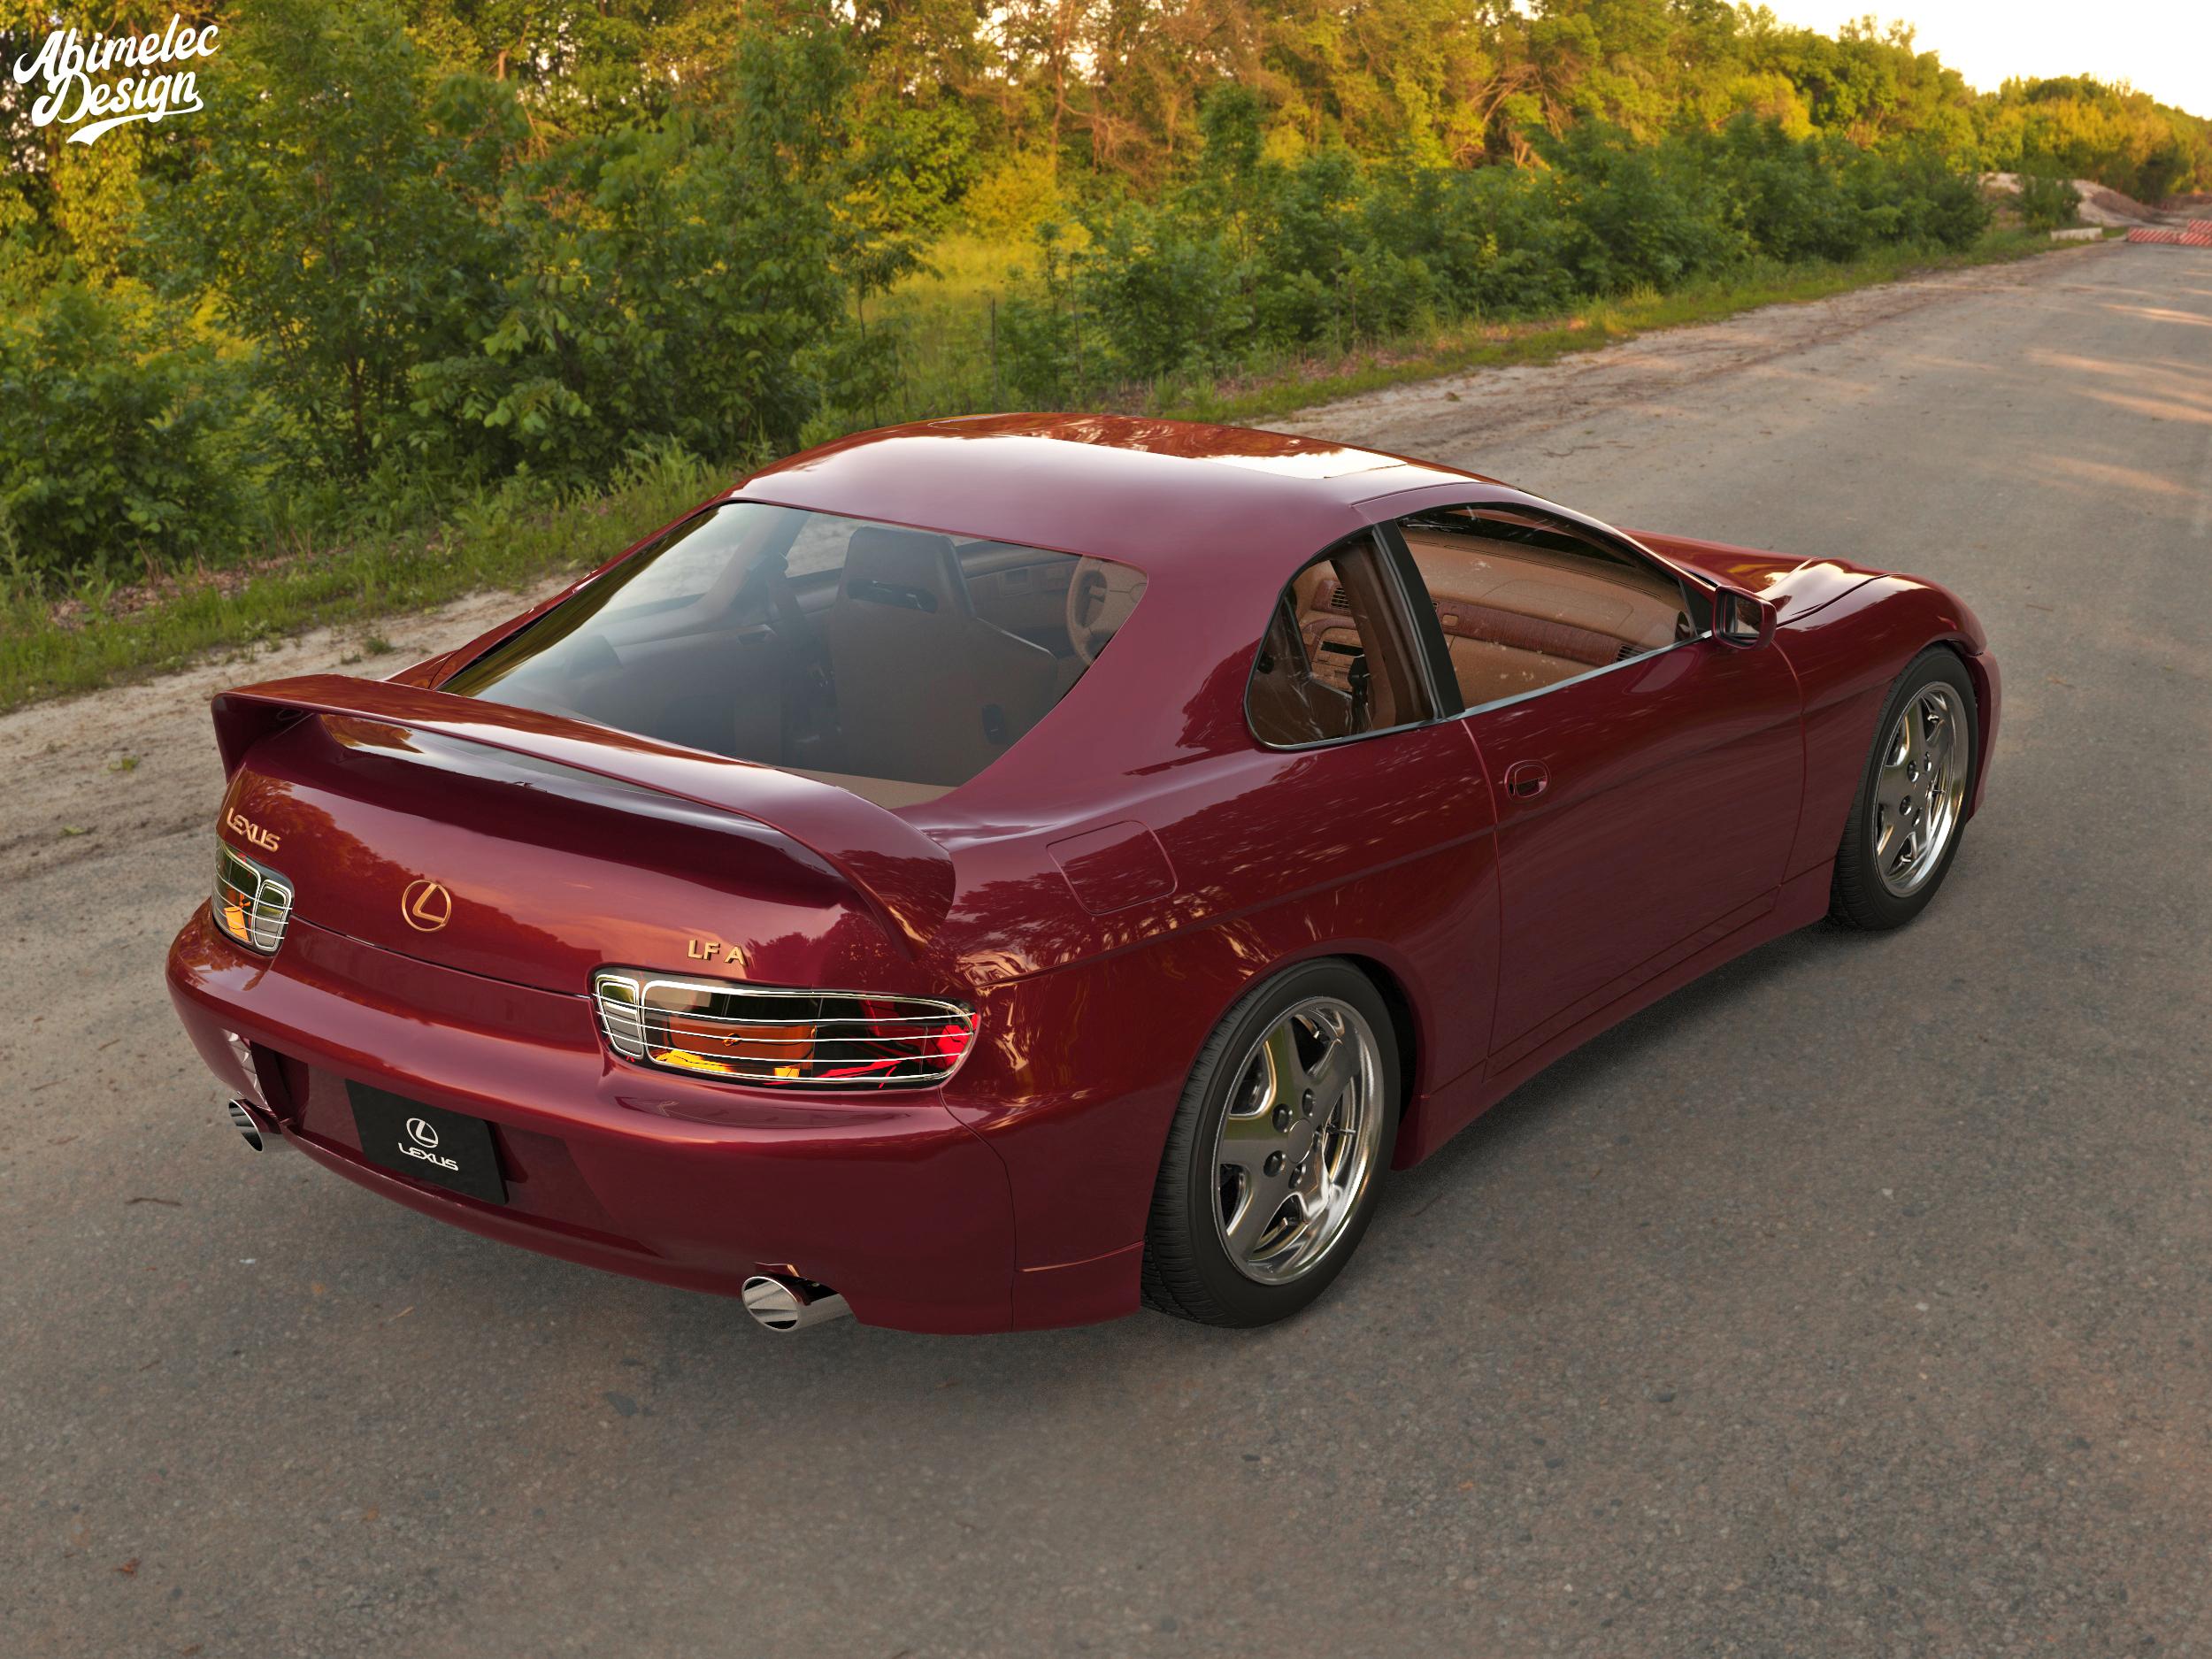 1997 Lexus LFA rear three quarter